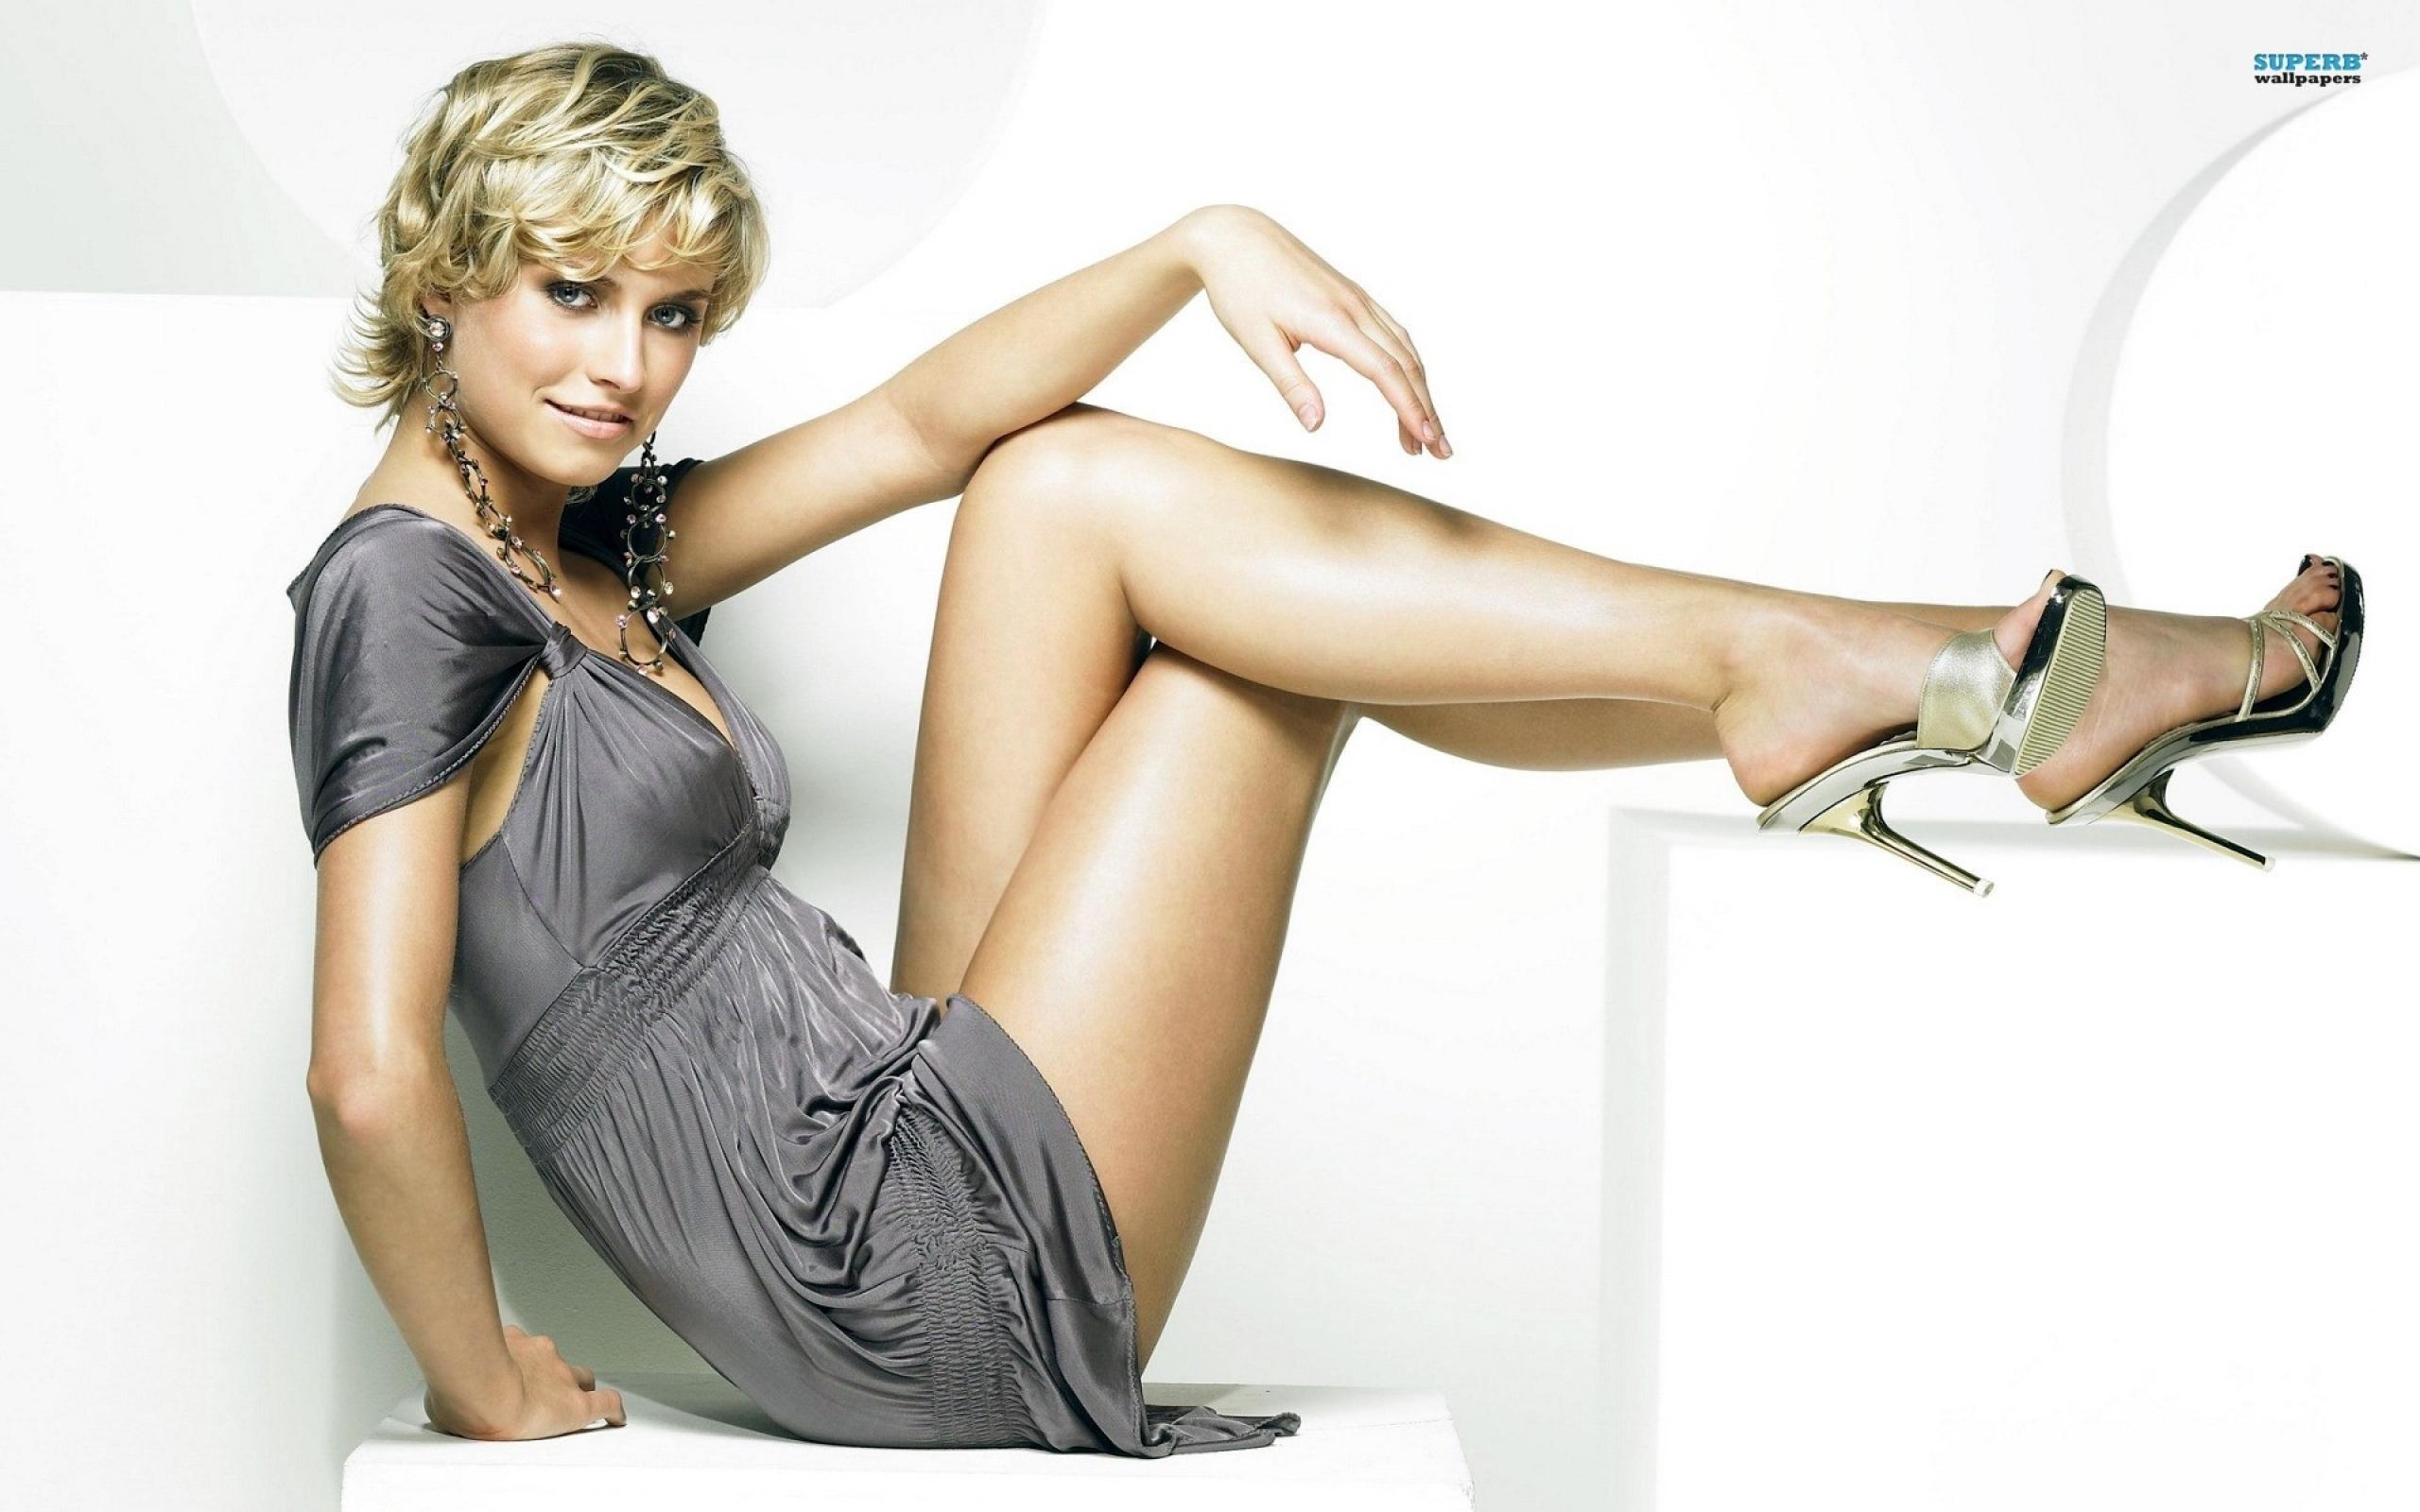 Download Wallpapers Download 2560x1600 legs women celebrity high 2560x1600